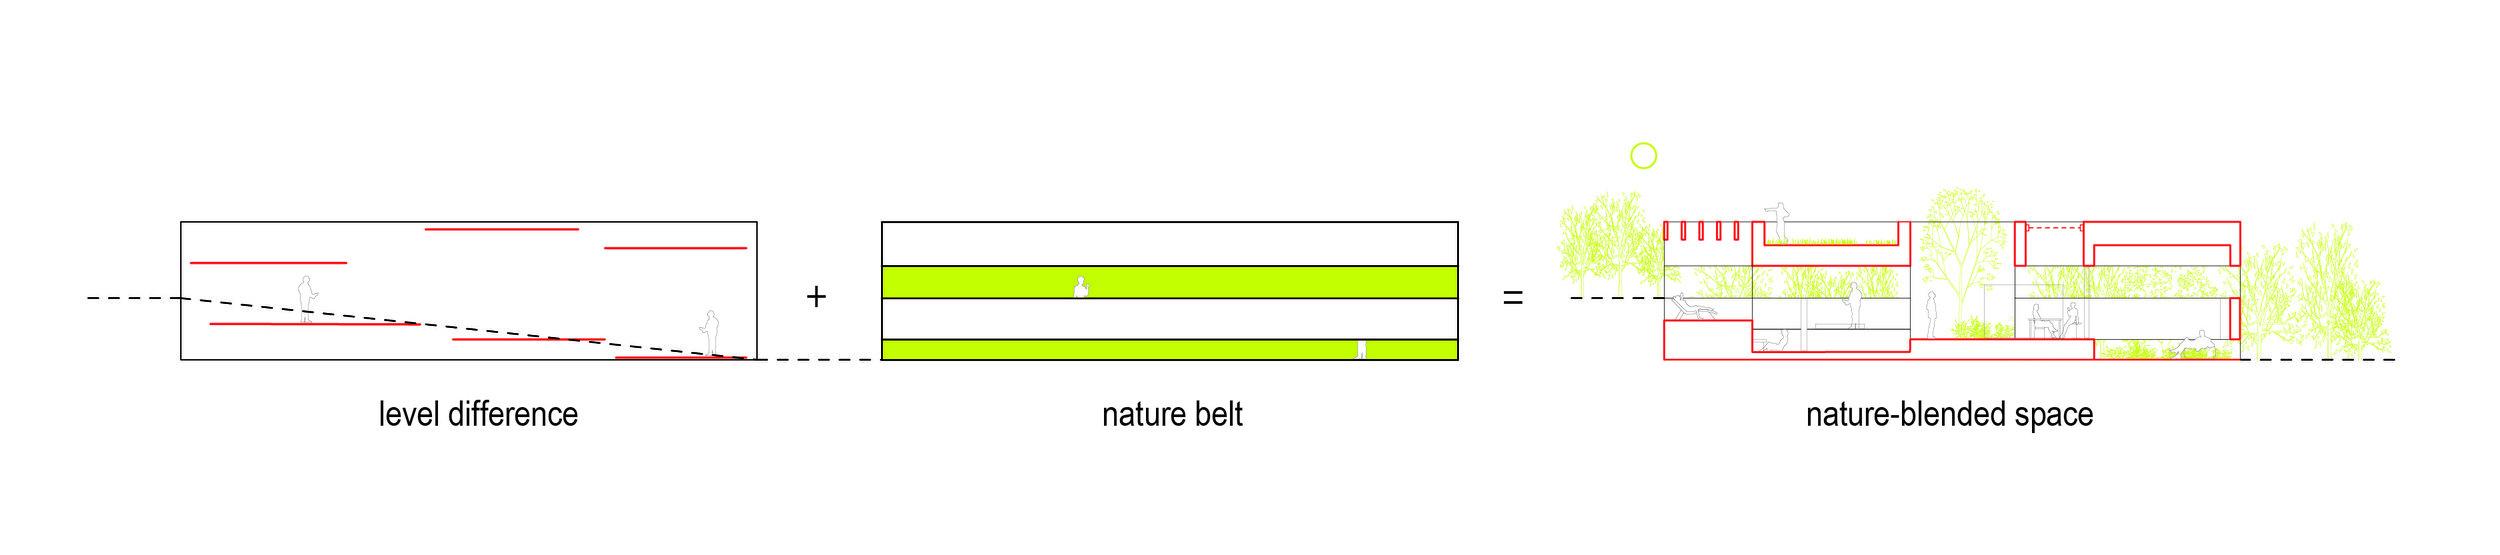 diagram-01-01.jpg